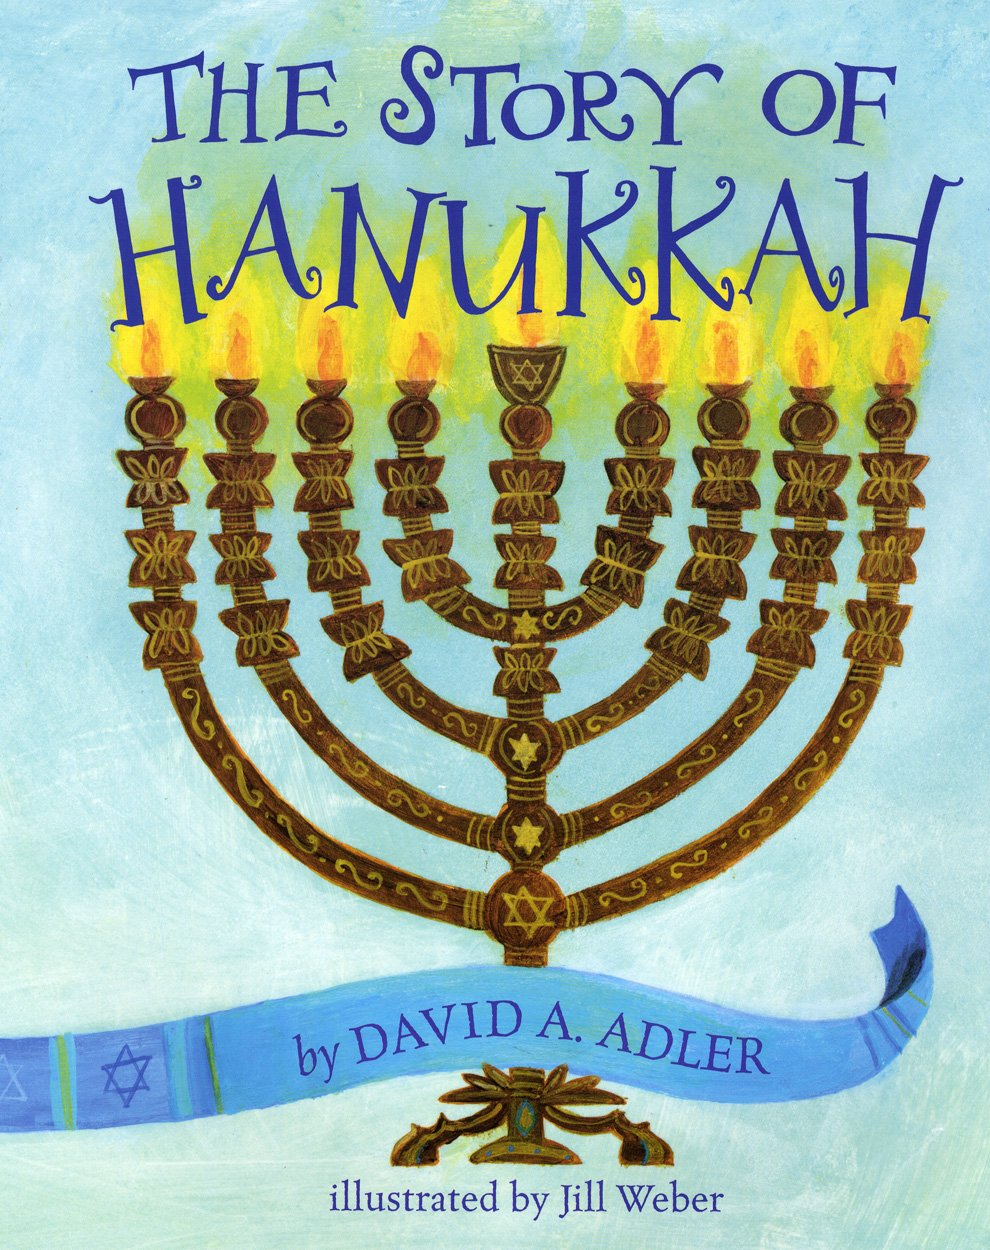 the story of hanukkah david a adler jill weber 9780823425471